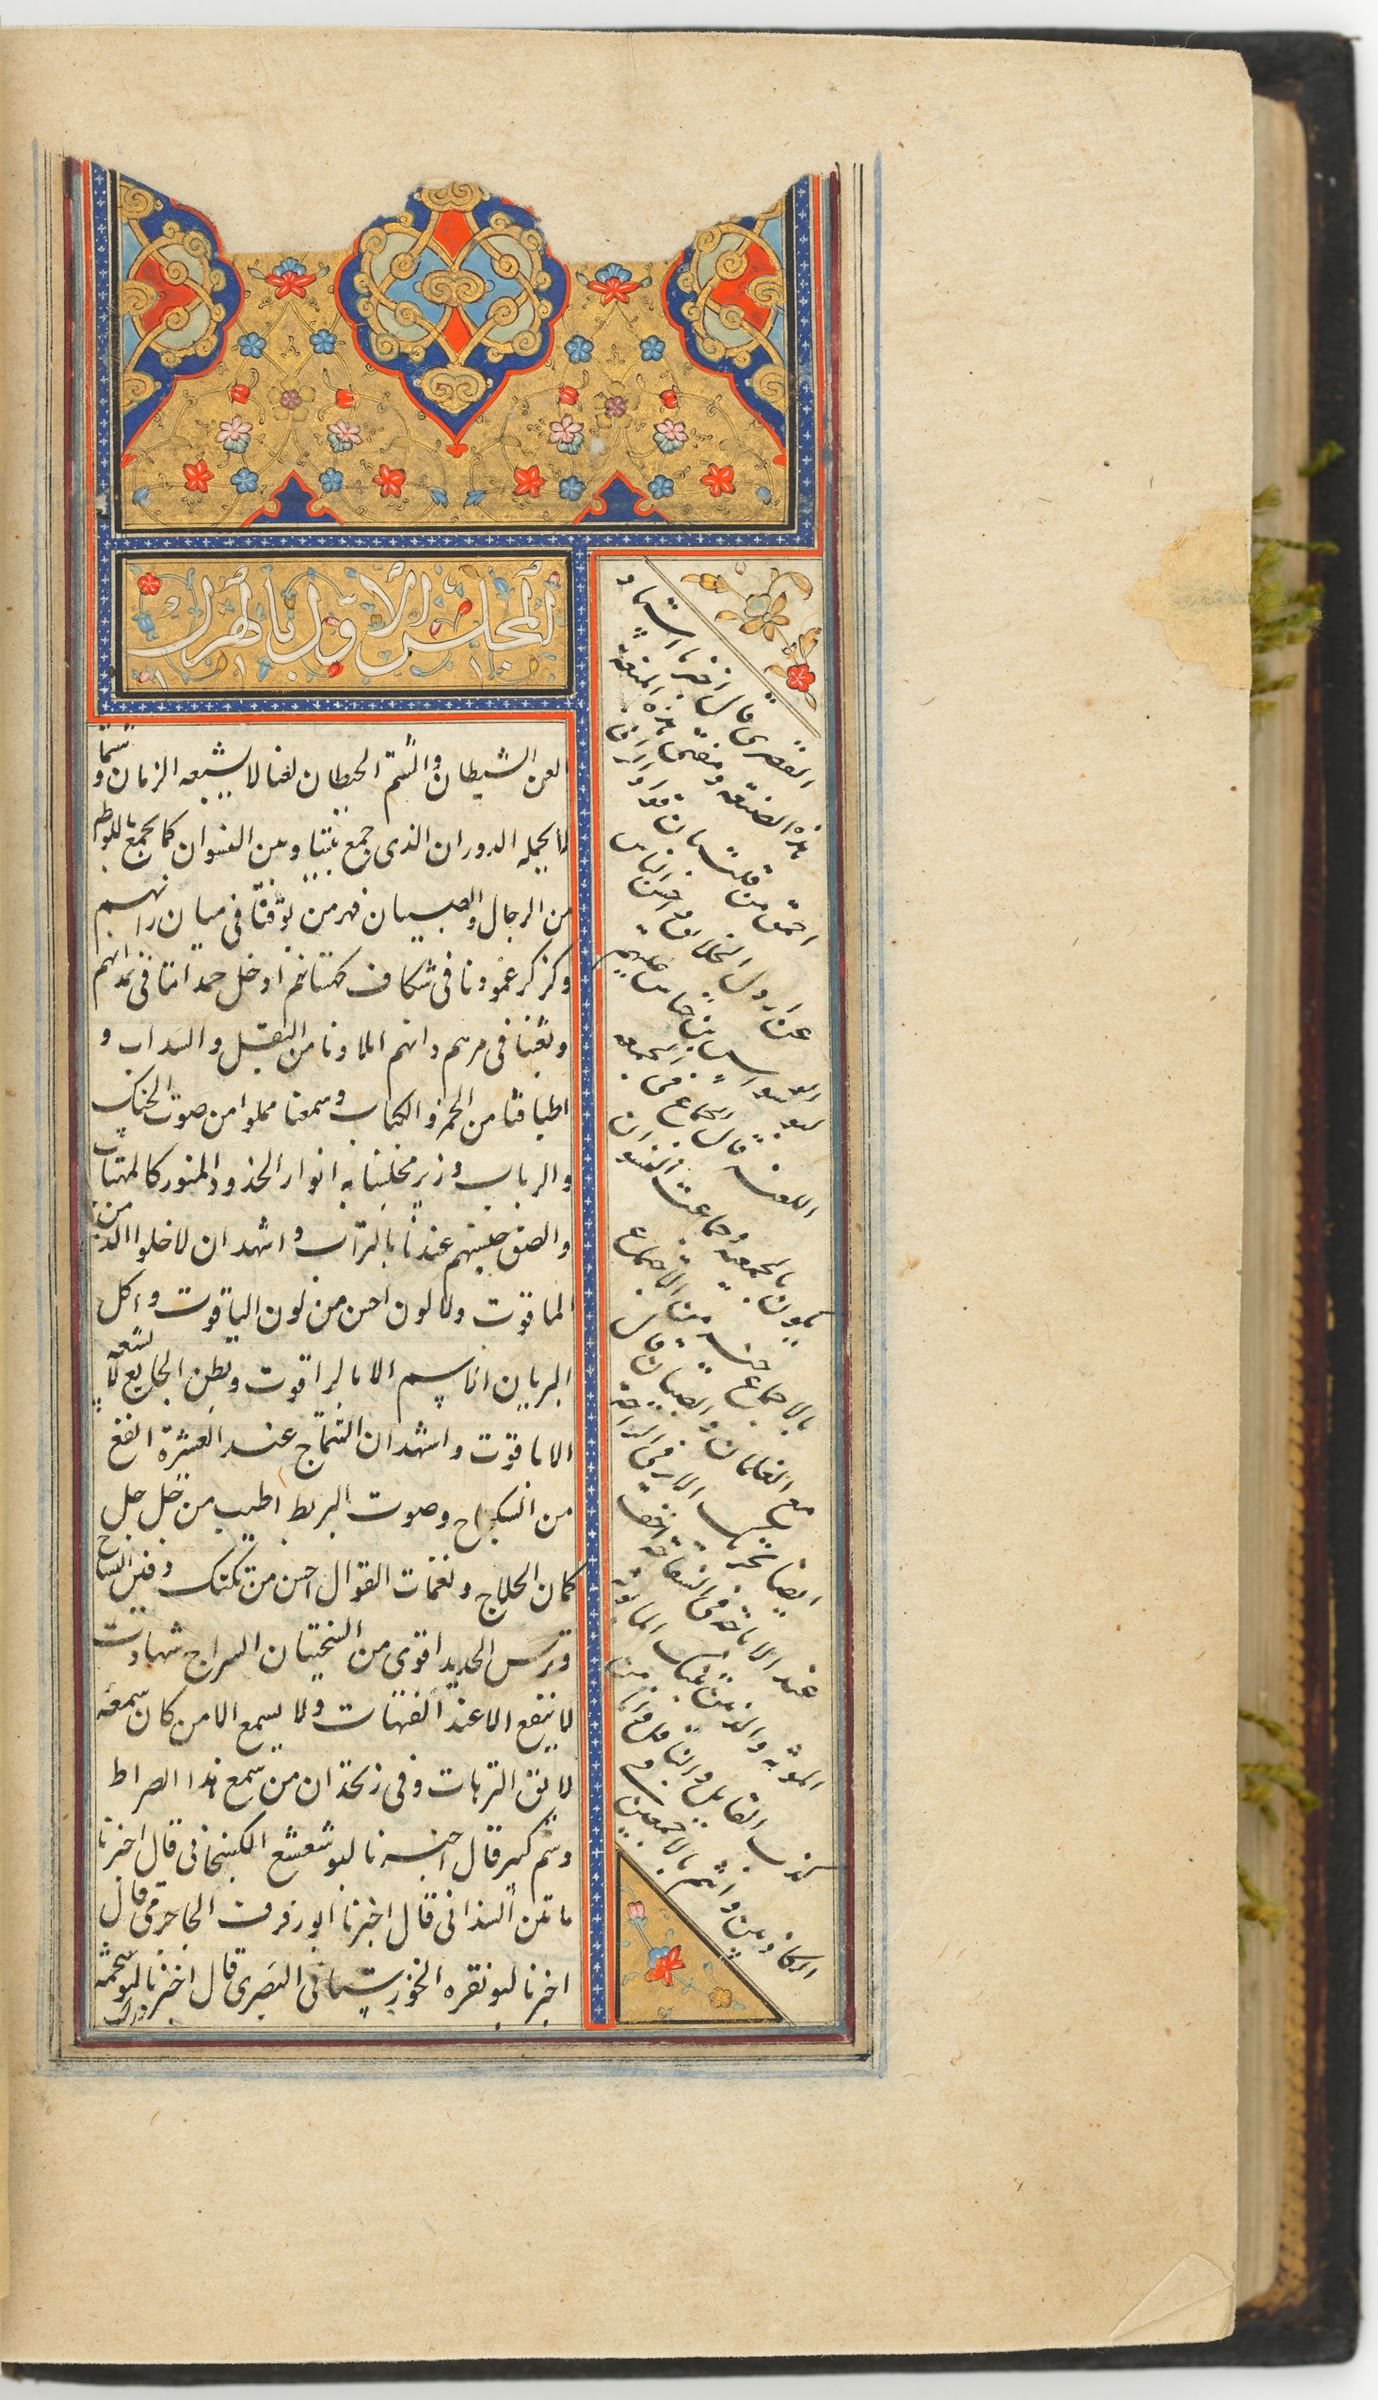 Text Folio With An Illuminated Heading (Text Recto; Text With An Illuminated Heading Verso Of Folio 337), From A Manuscript Of The Kulliyat Of Sa'di